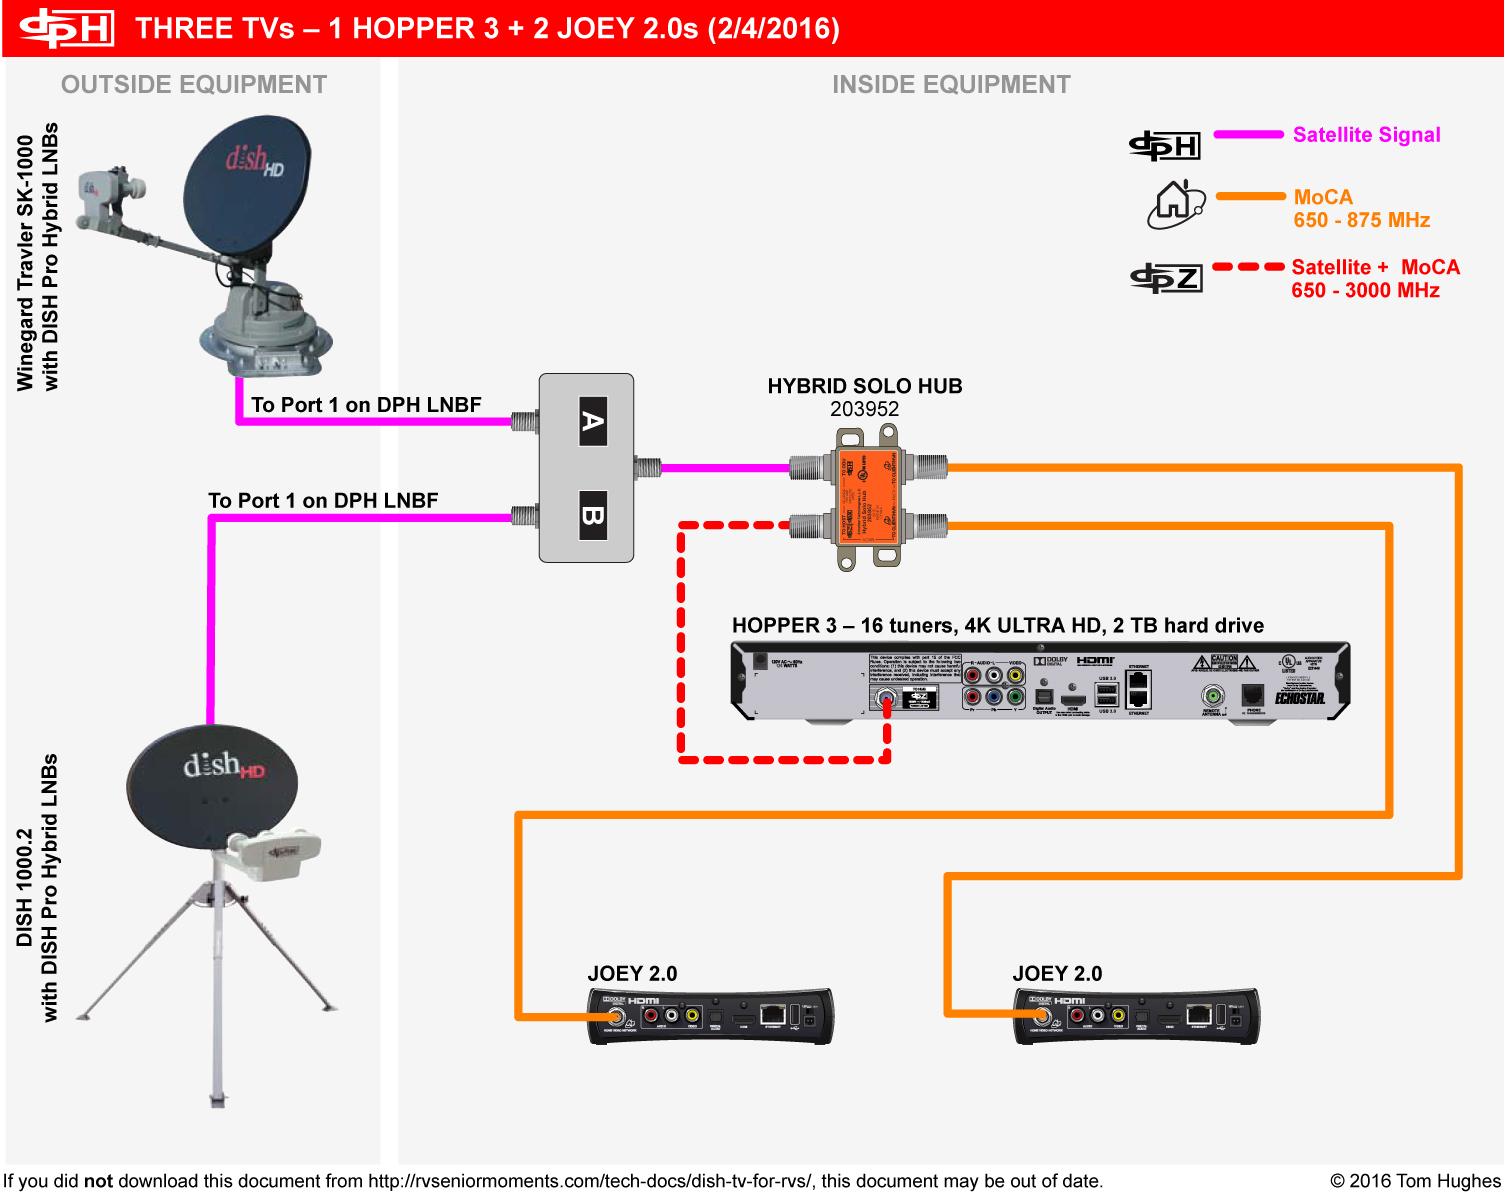 Wiring Diagram Dish Network 722k - Wiring Diagram